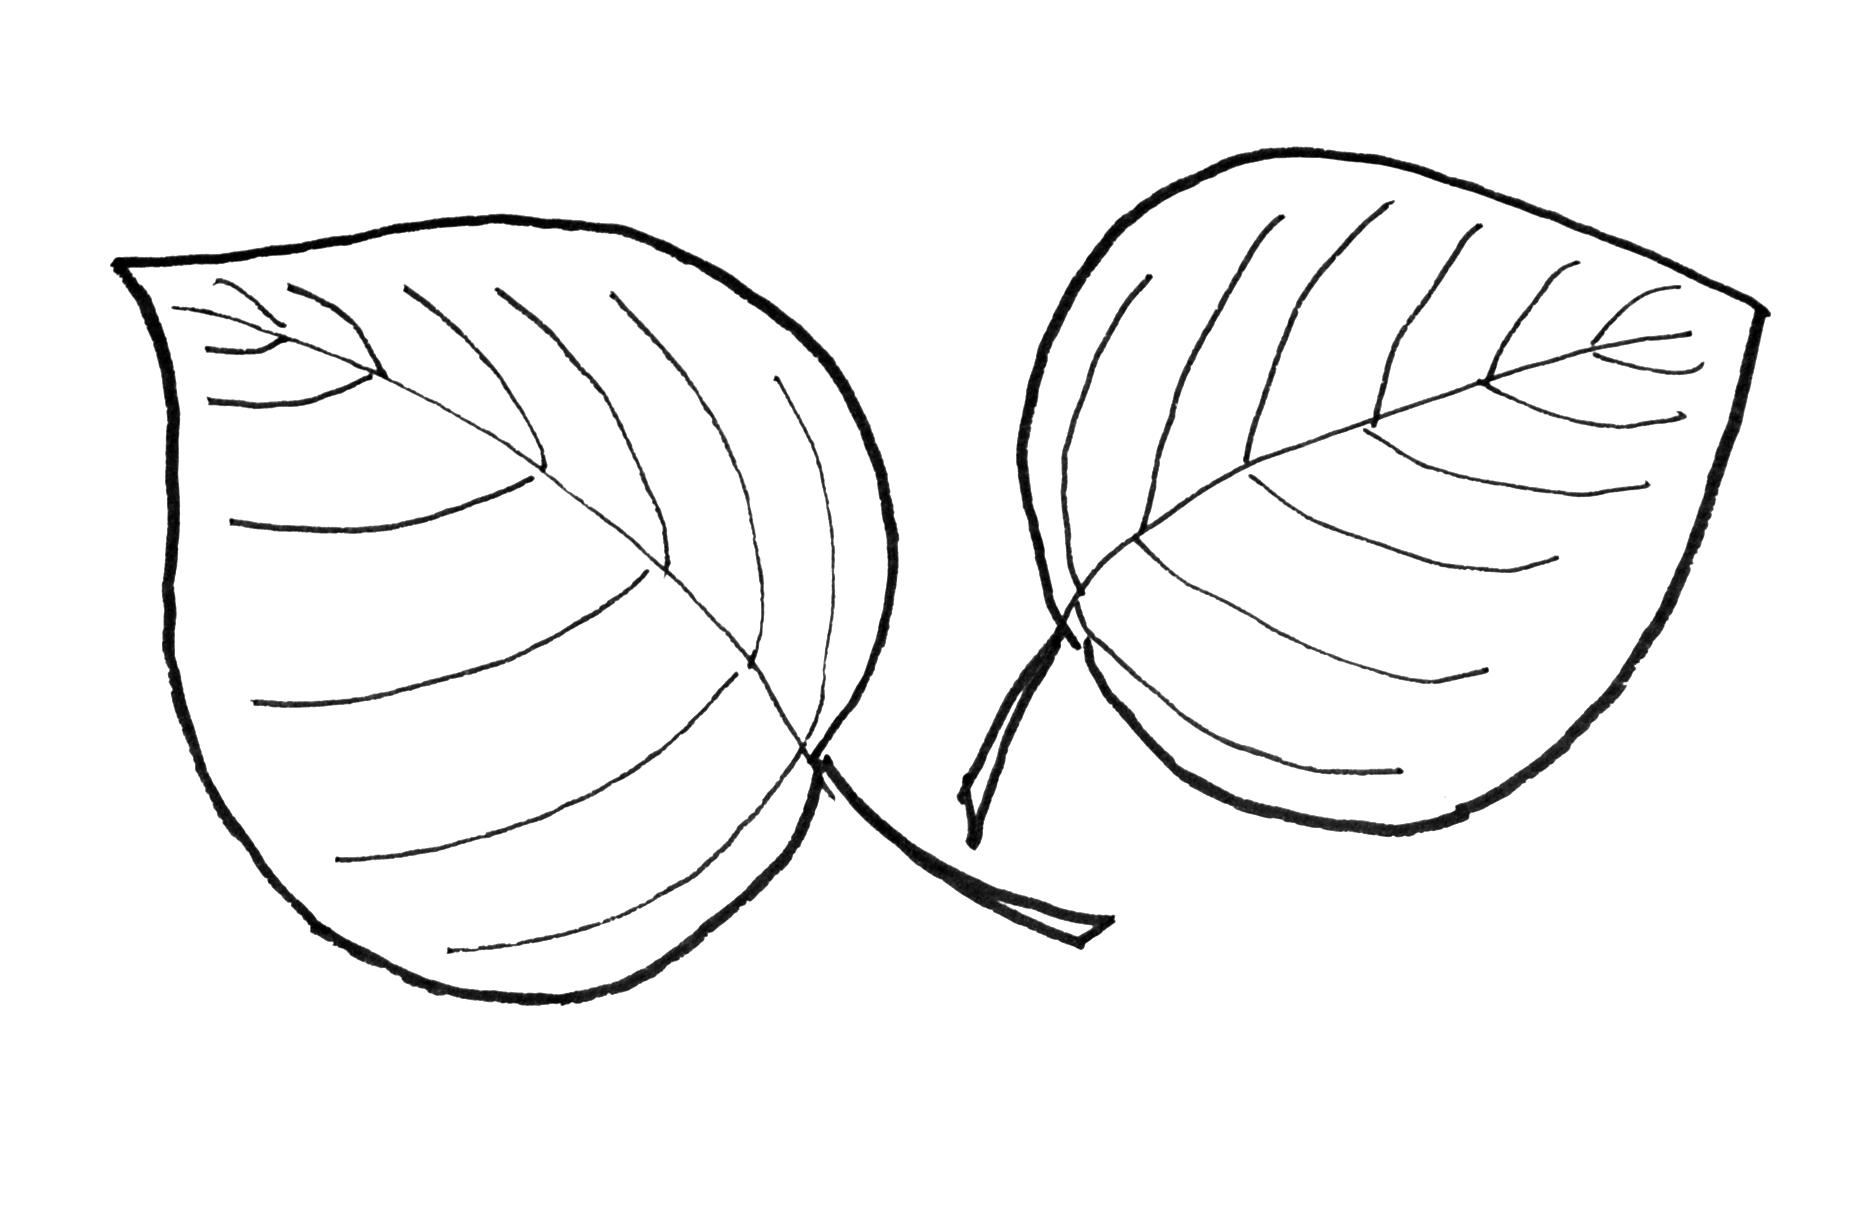 Falling Leaf Drawing At Getdrawings